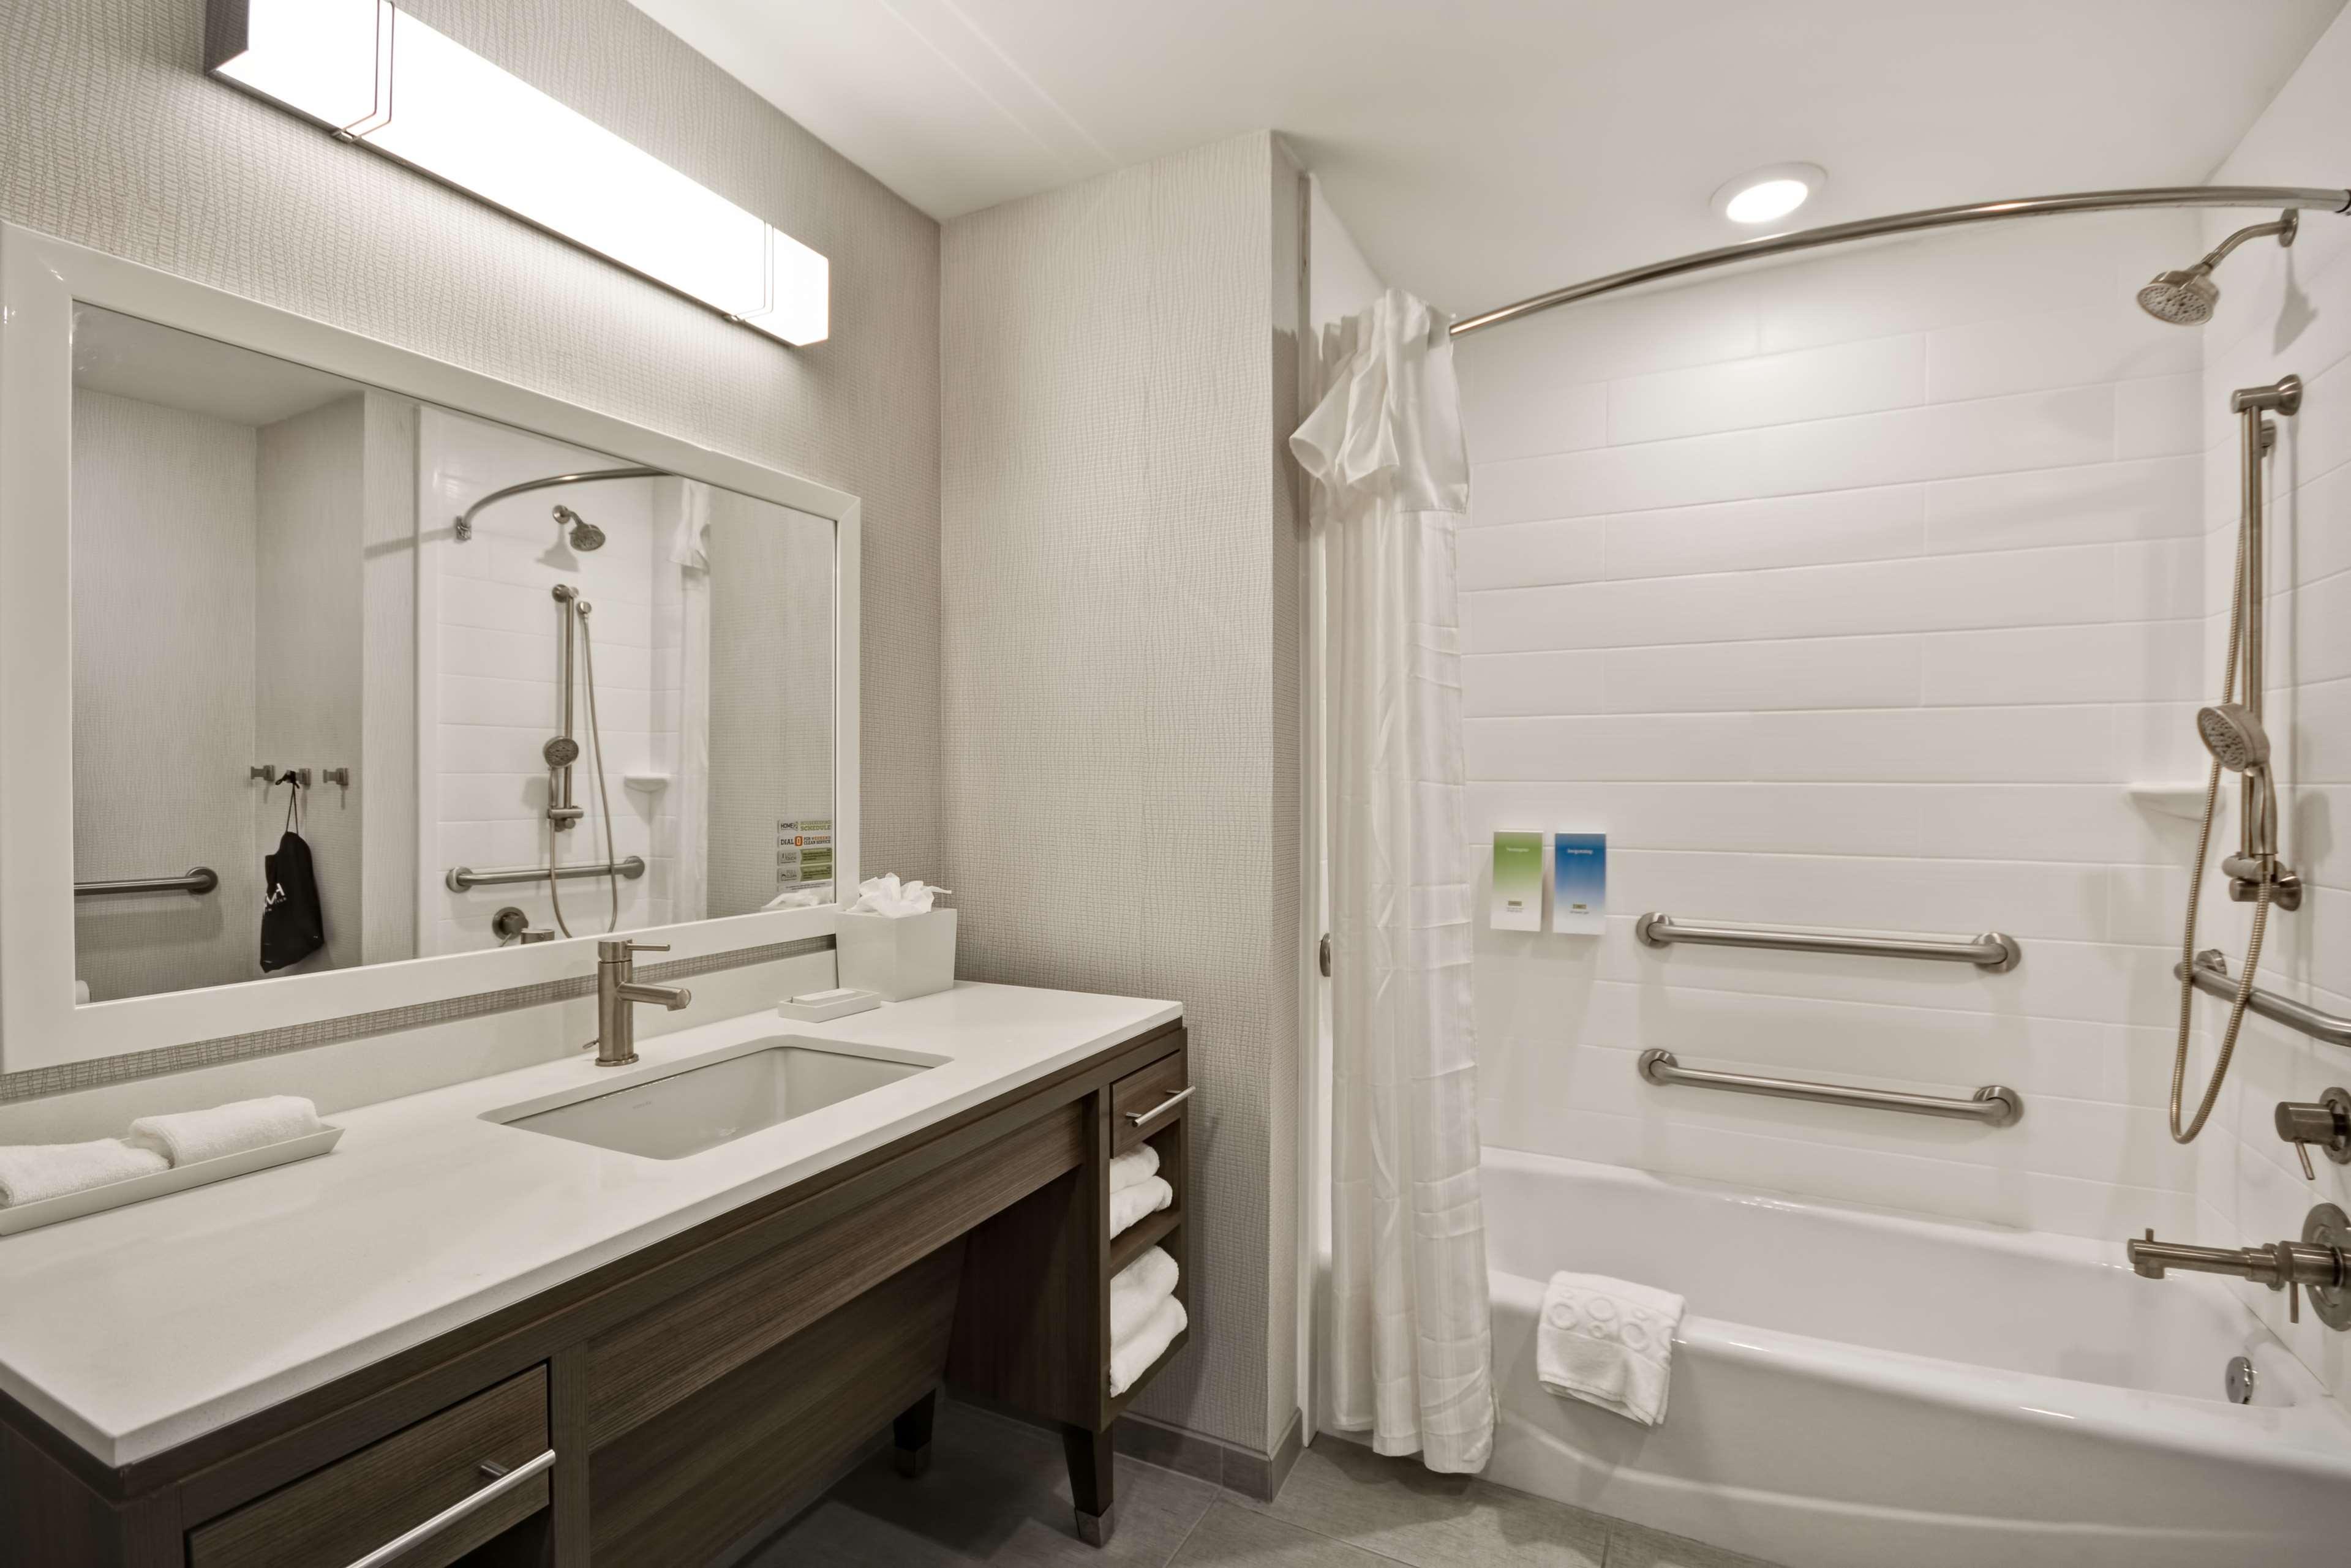 Home2 Suites by Hilton Atlanta West Lithia Springs image 27